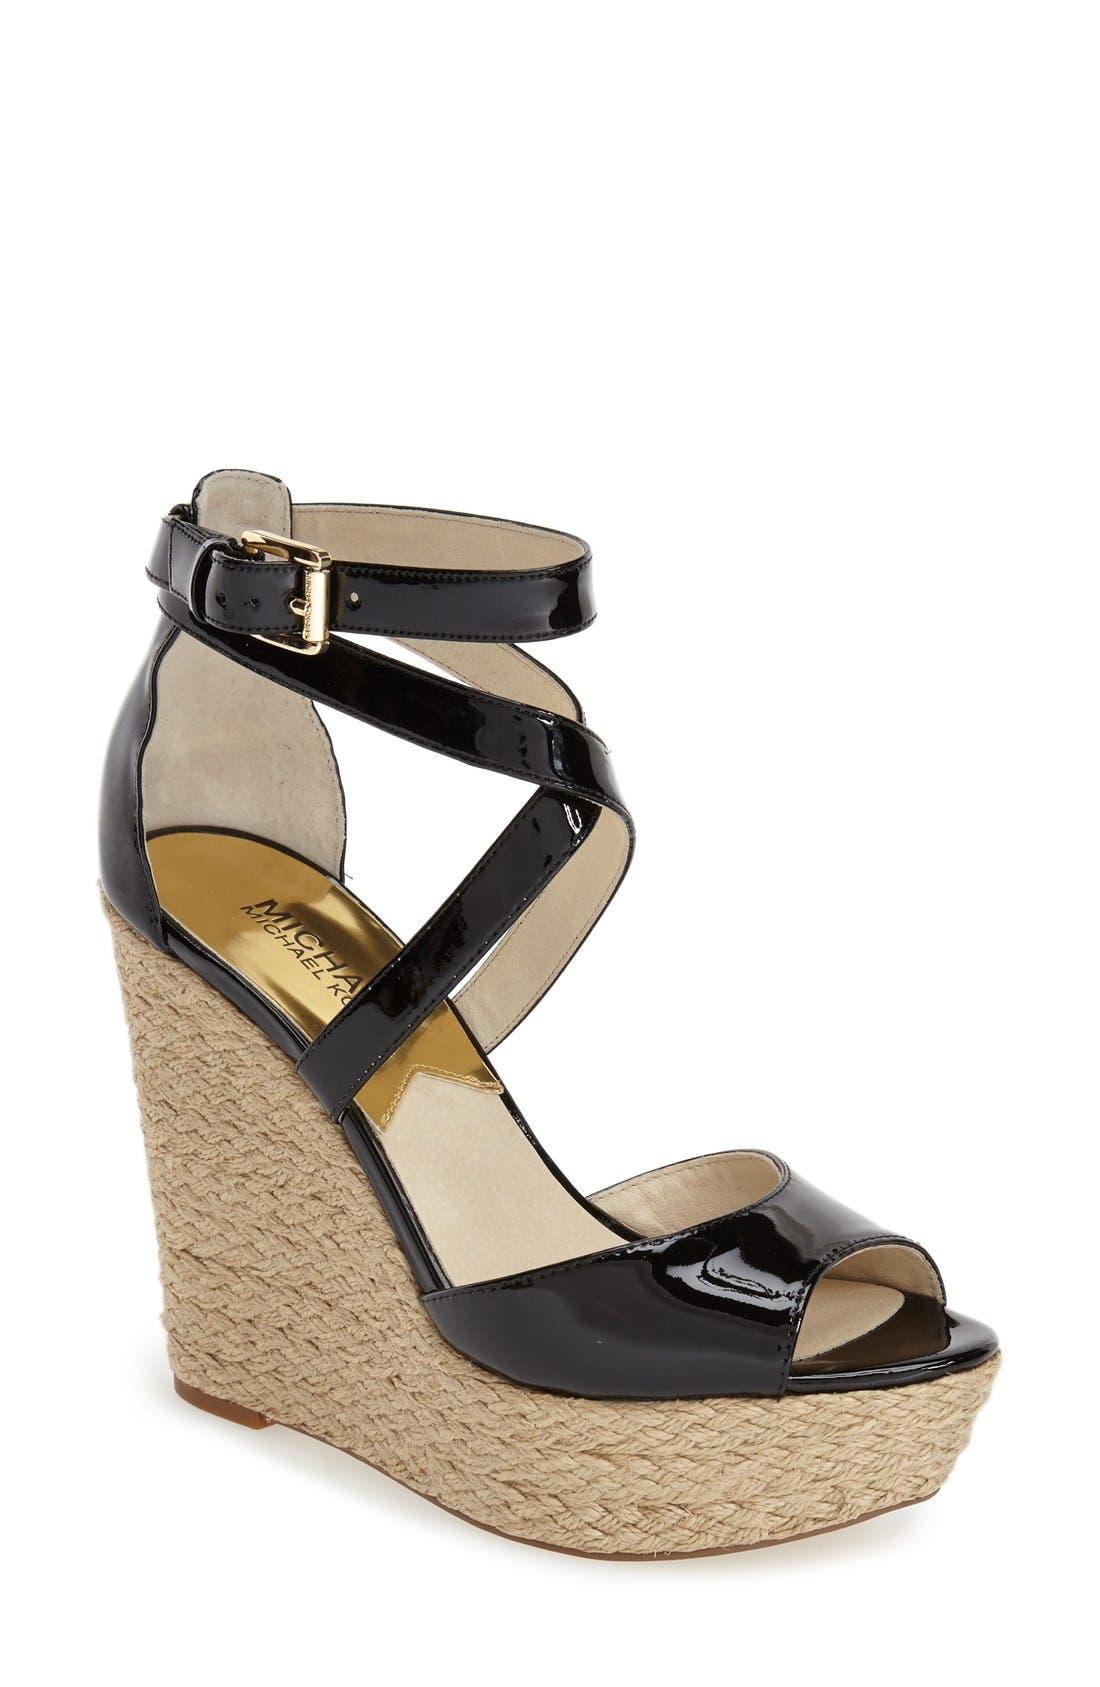 'Gabriella' Espadrille Wedge Sandal, Main, color, 001